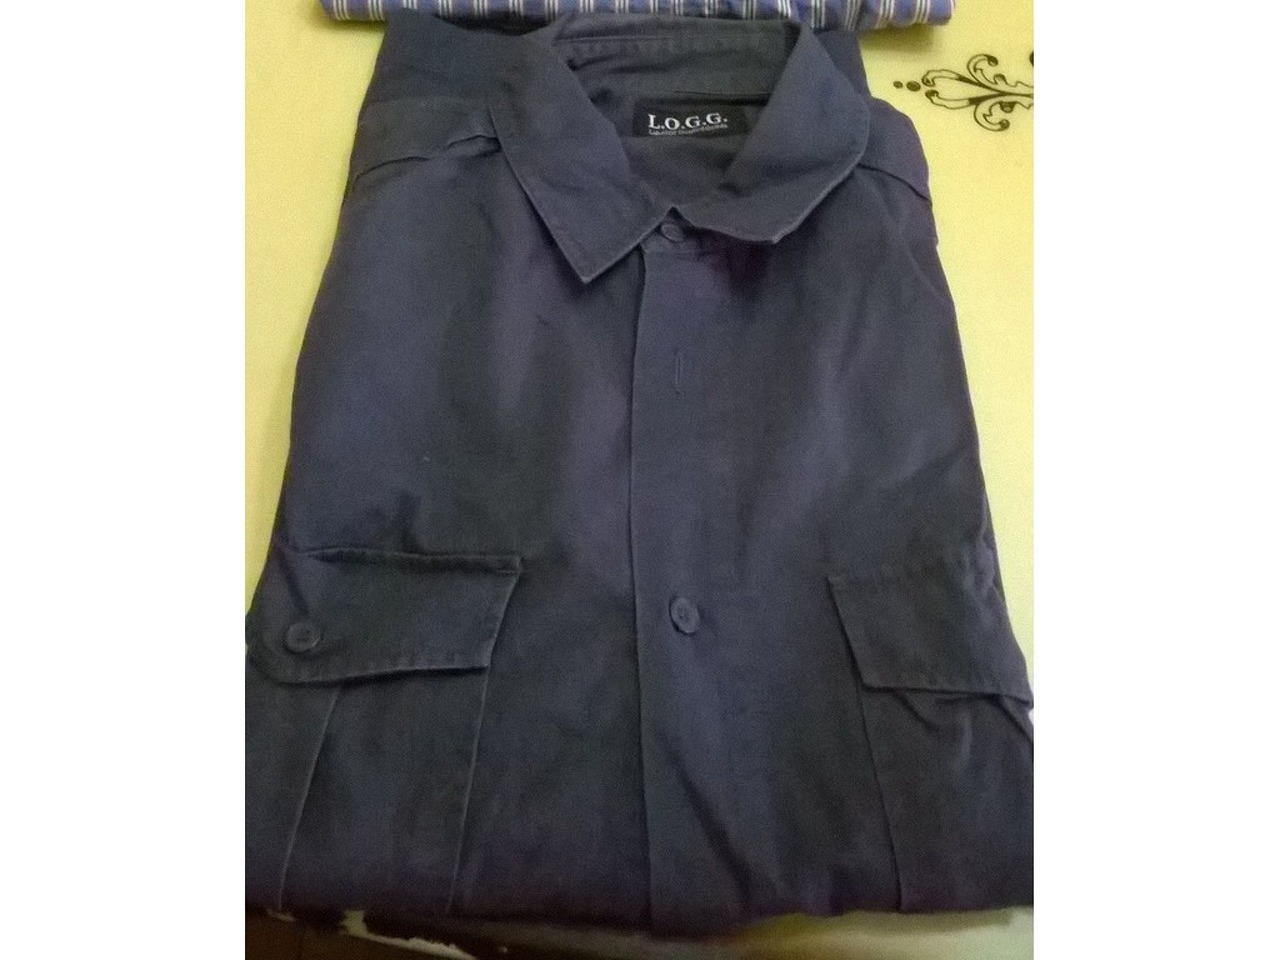 Camisas Barred's, G.Coast, C.Jeans, Cayo Largo, LOGG, N.Corrêa, etc - 5/8